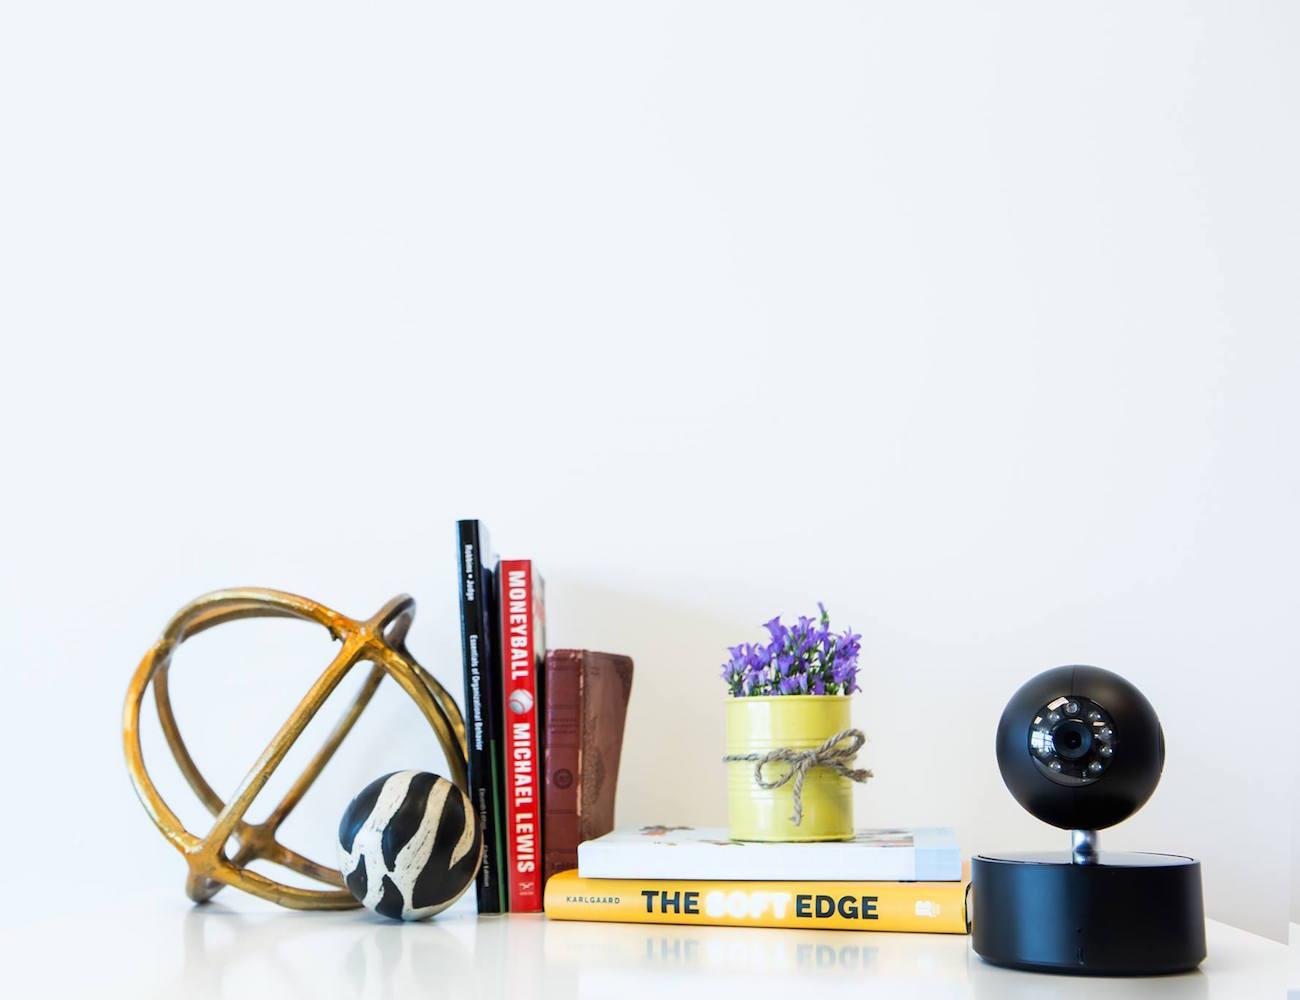 Remocam: Smart IoT Security Camera for Smart Homes